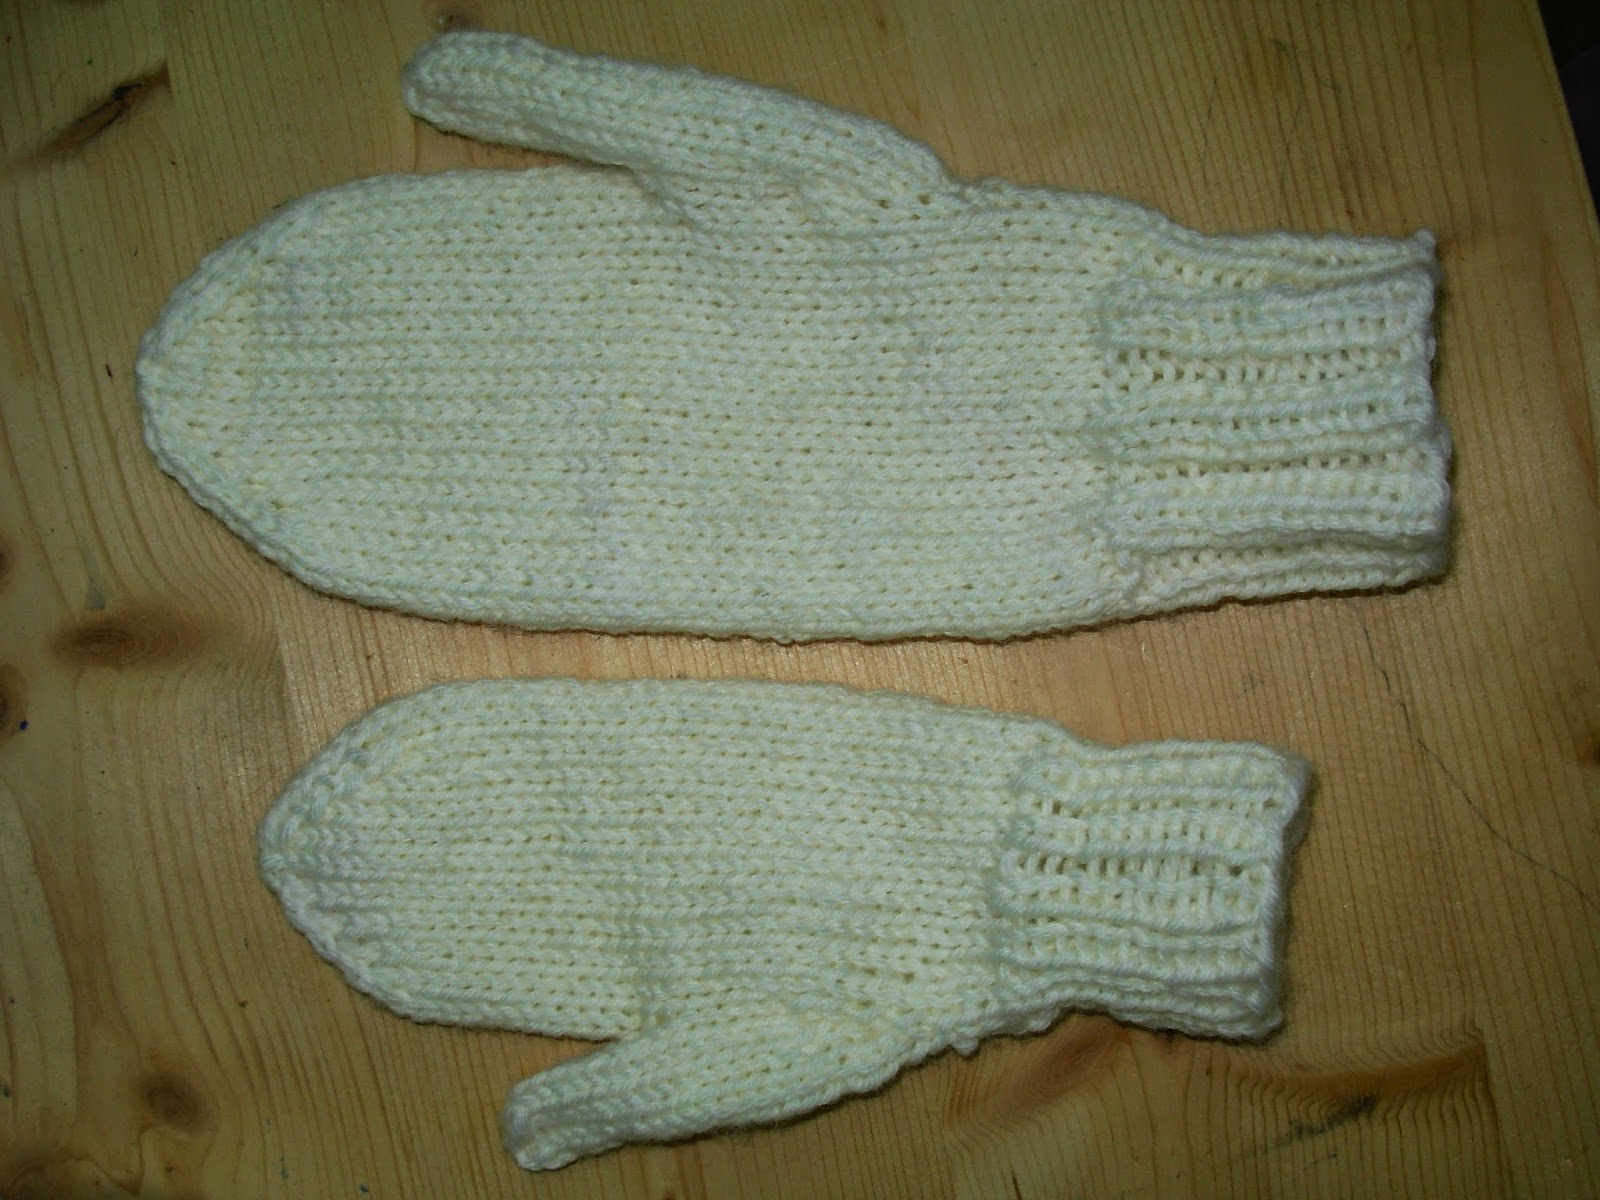 Handschuhe zur Geschichte